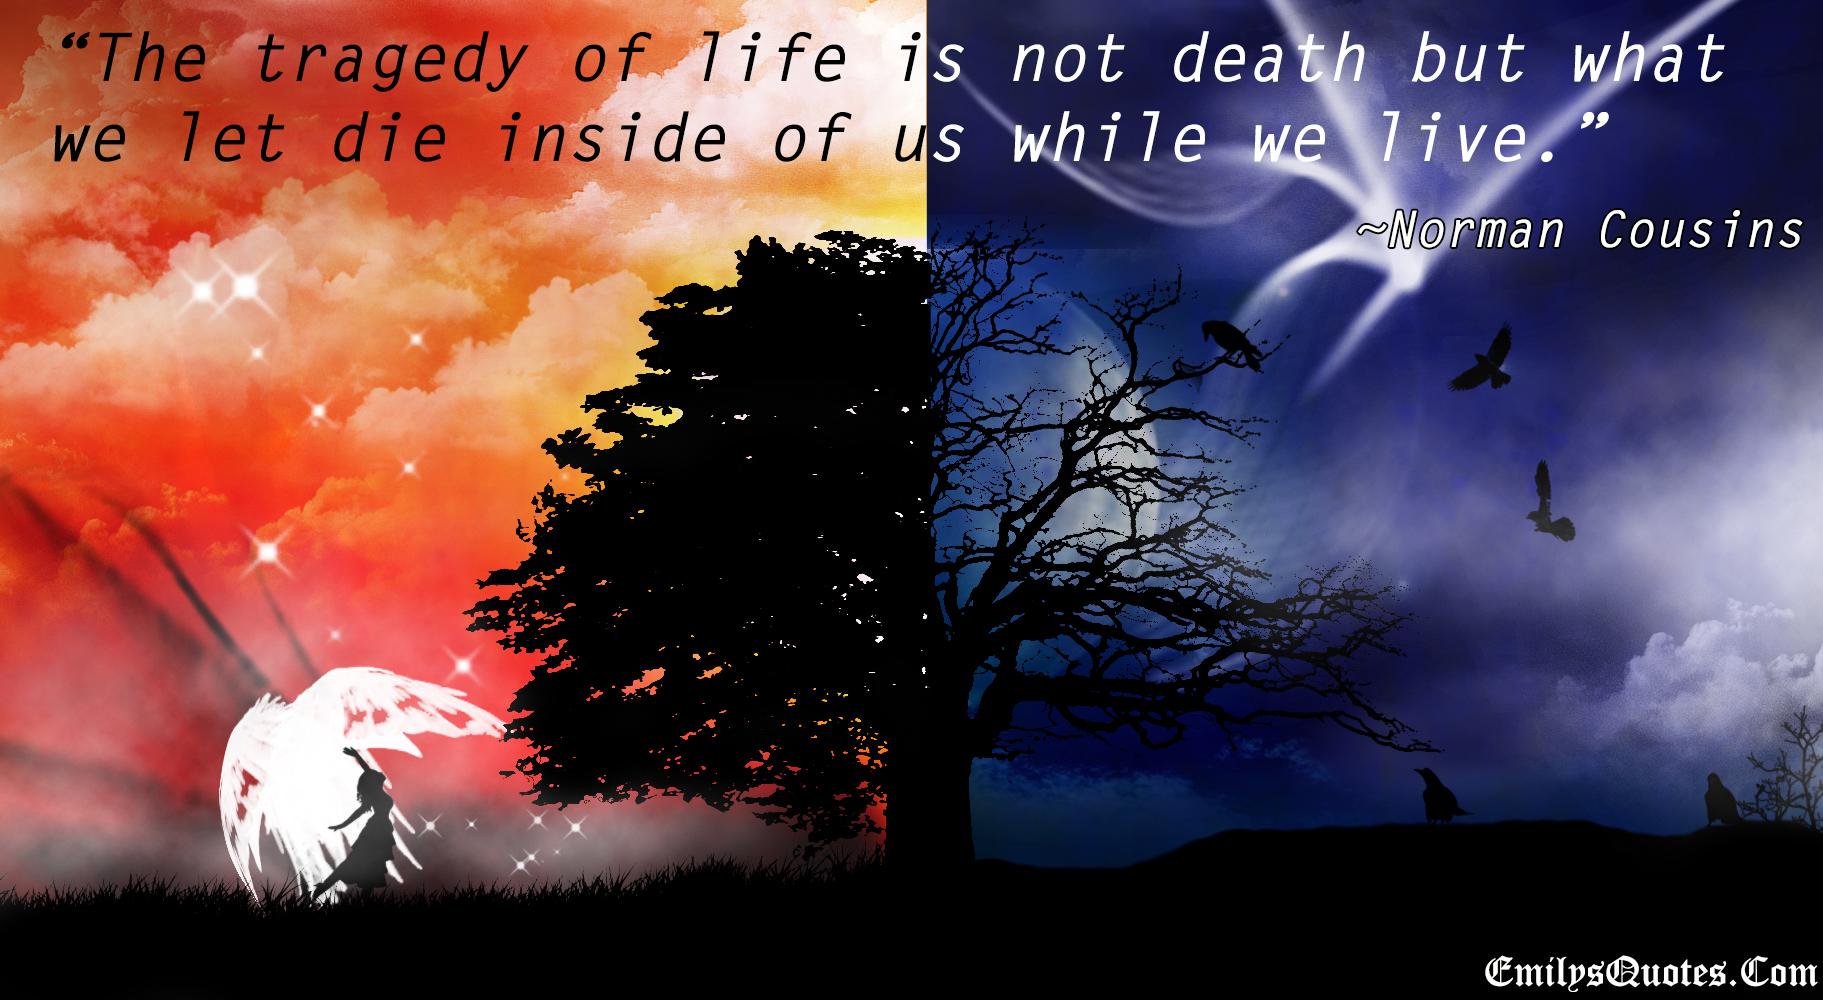 EmilysQuotes.Com - life, wisdom, death, Norman Cousins, intelligence, tragedy